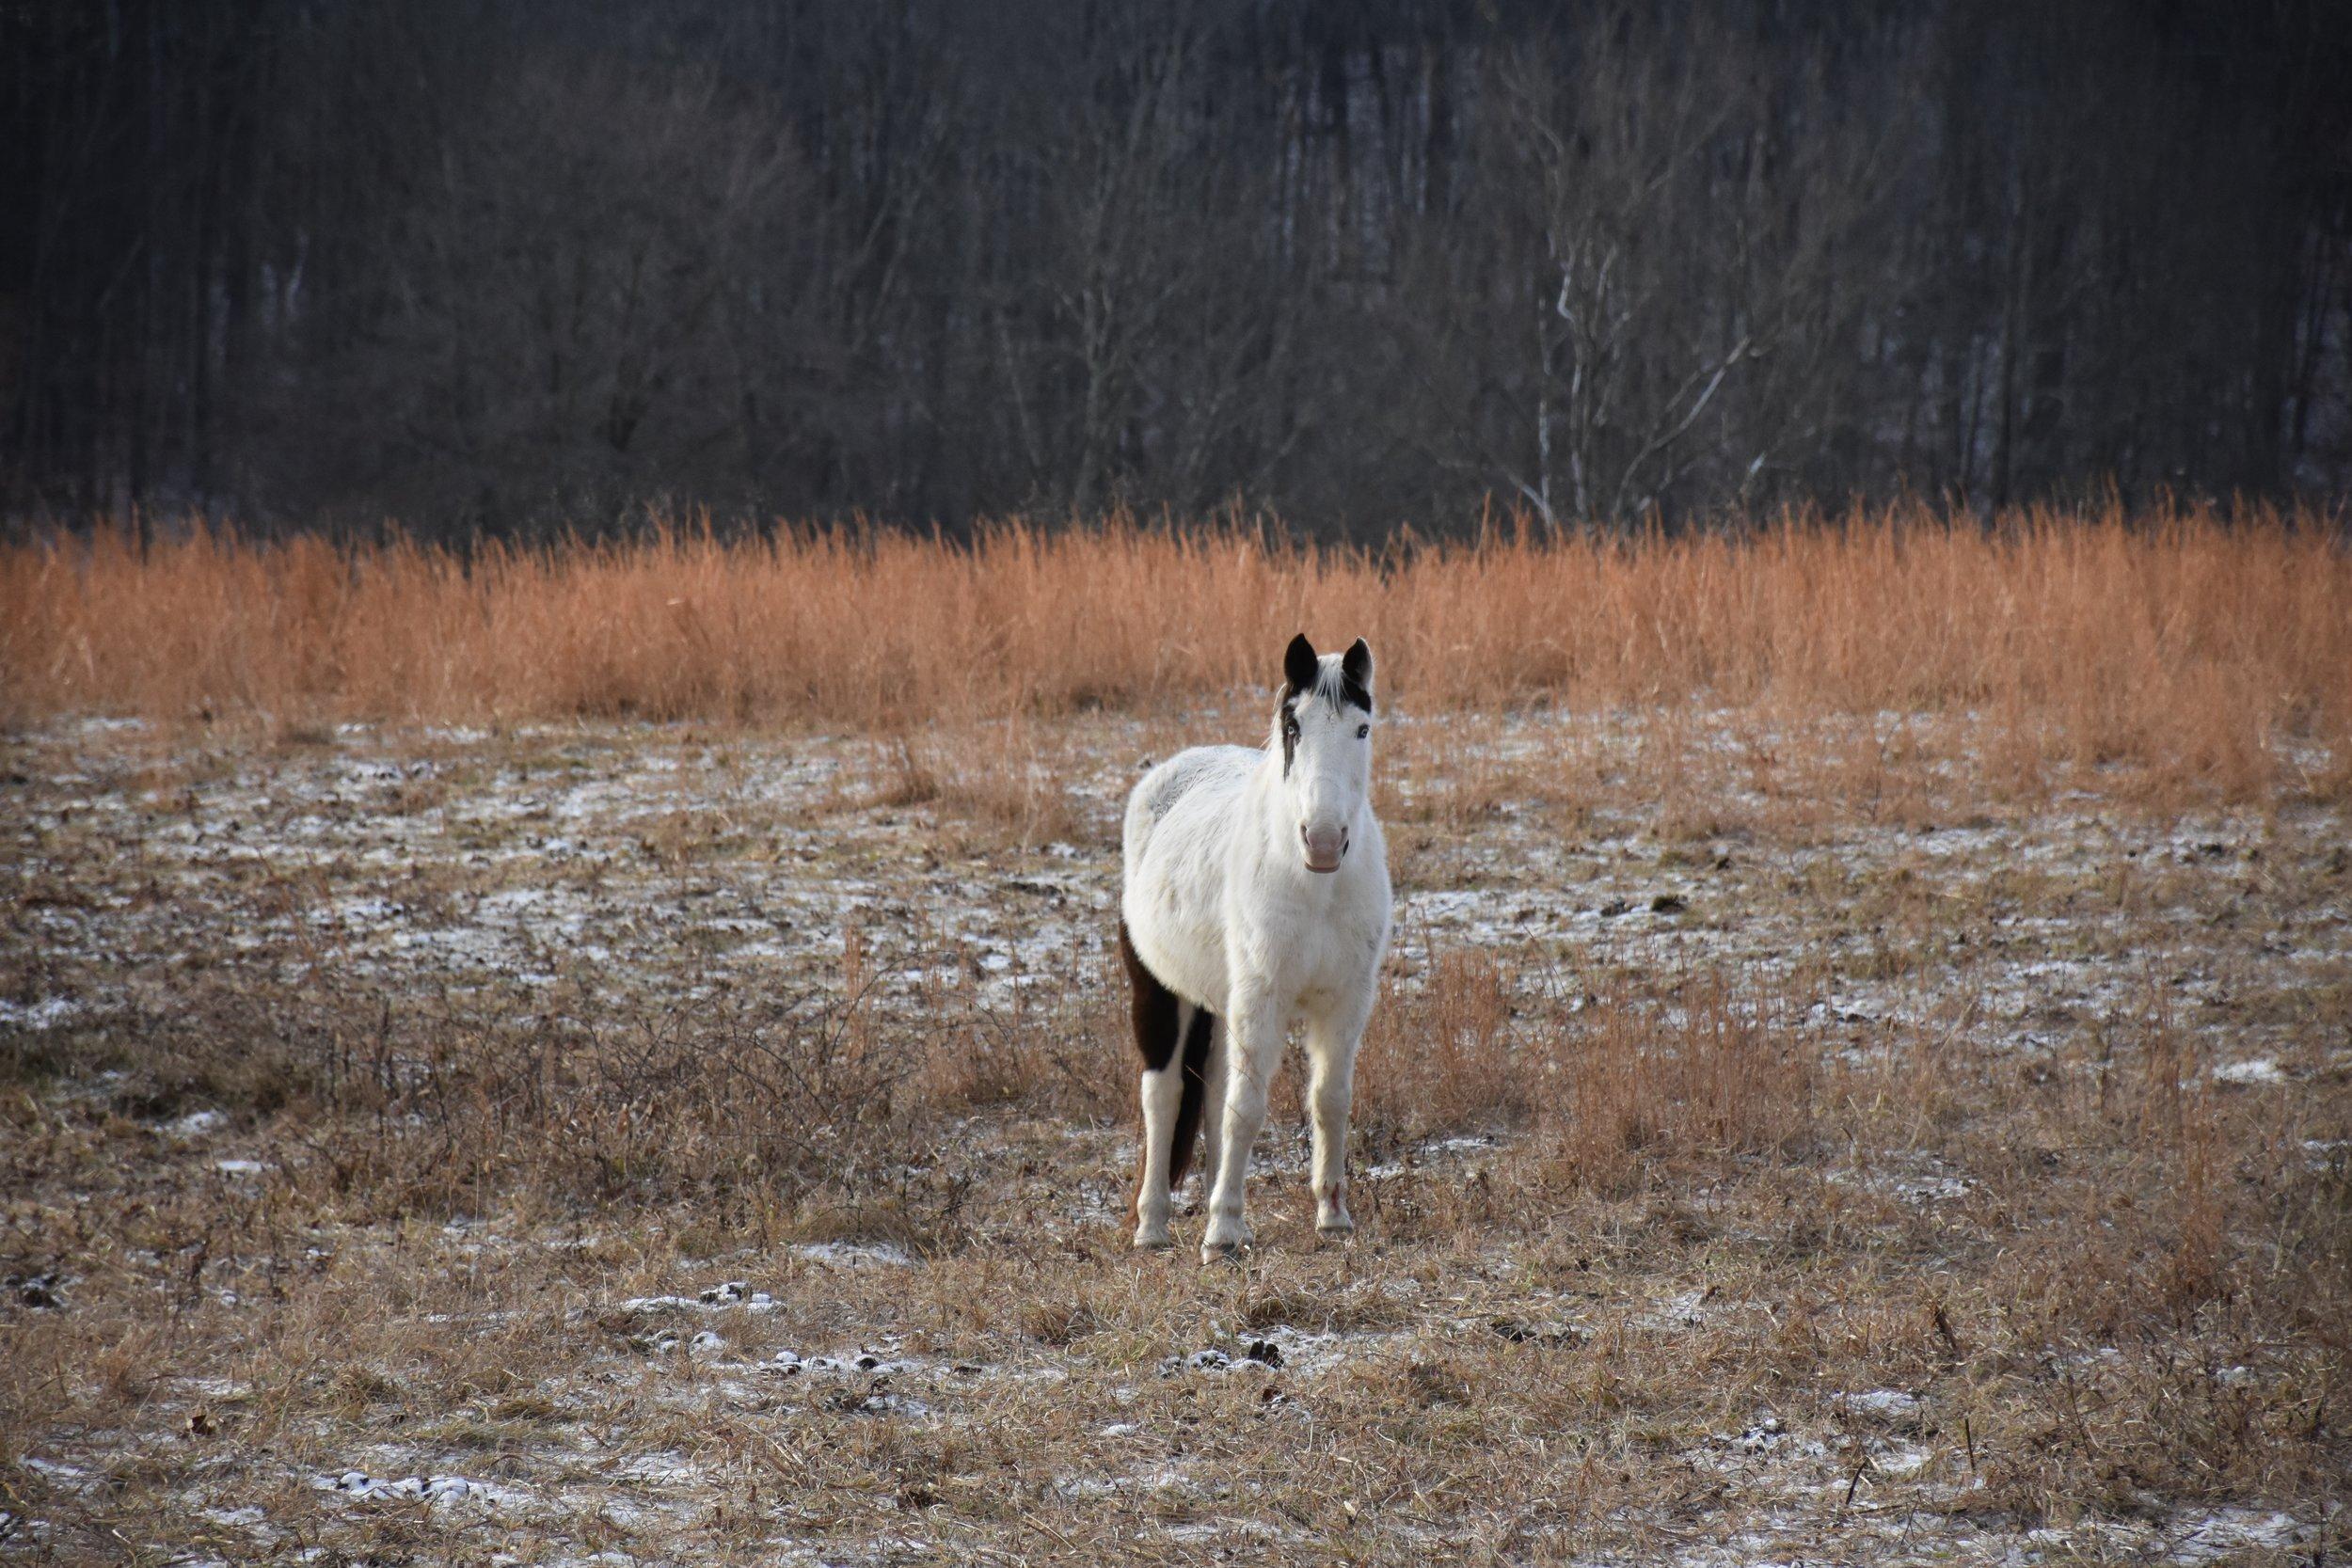 Horse, December 2015.